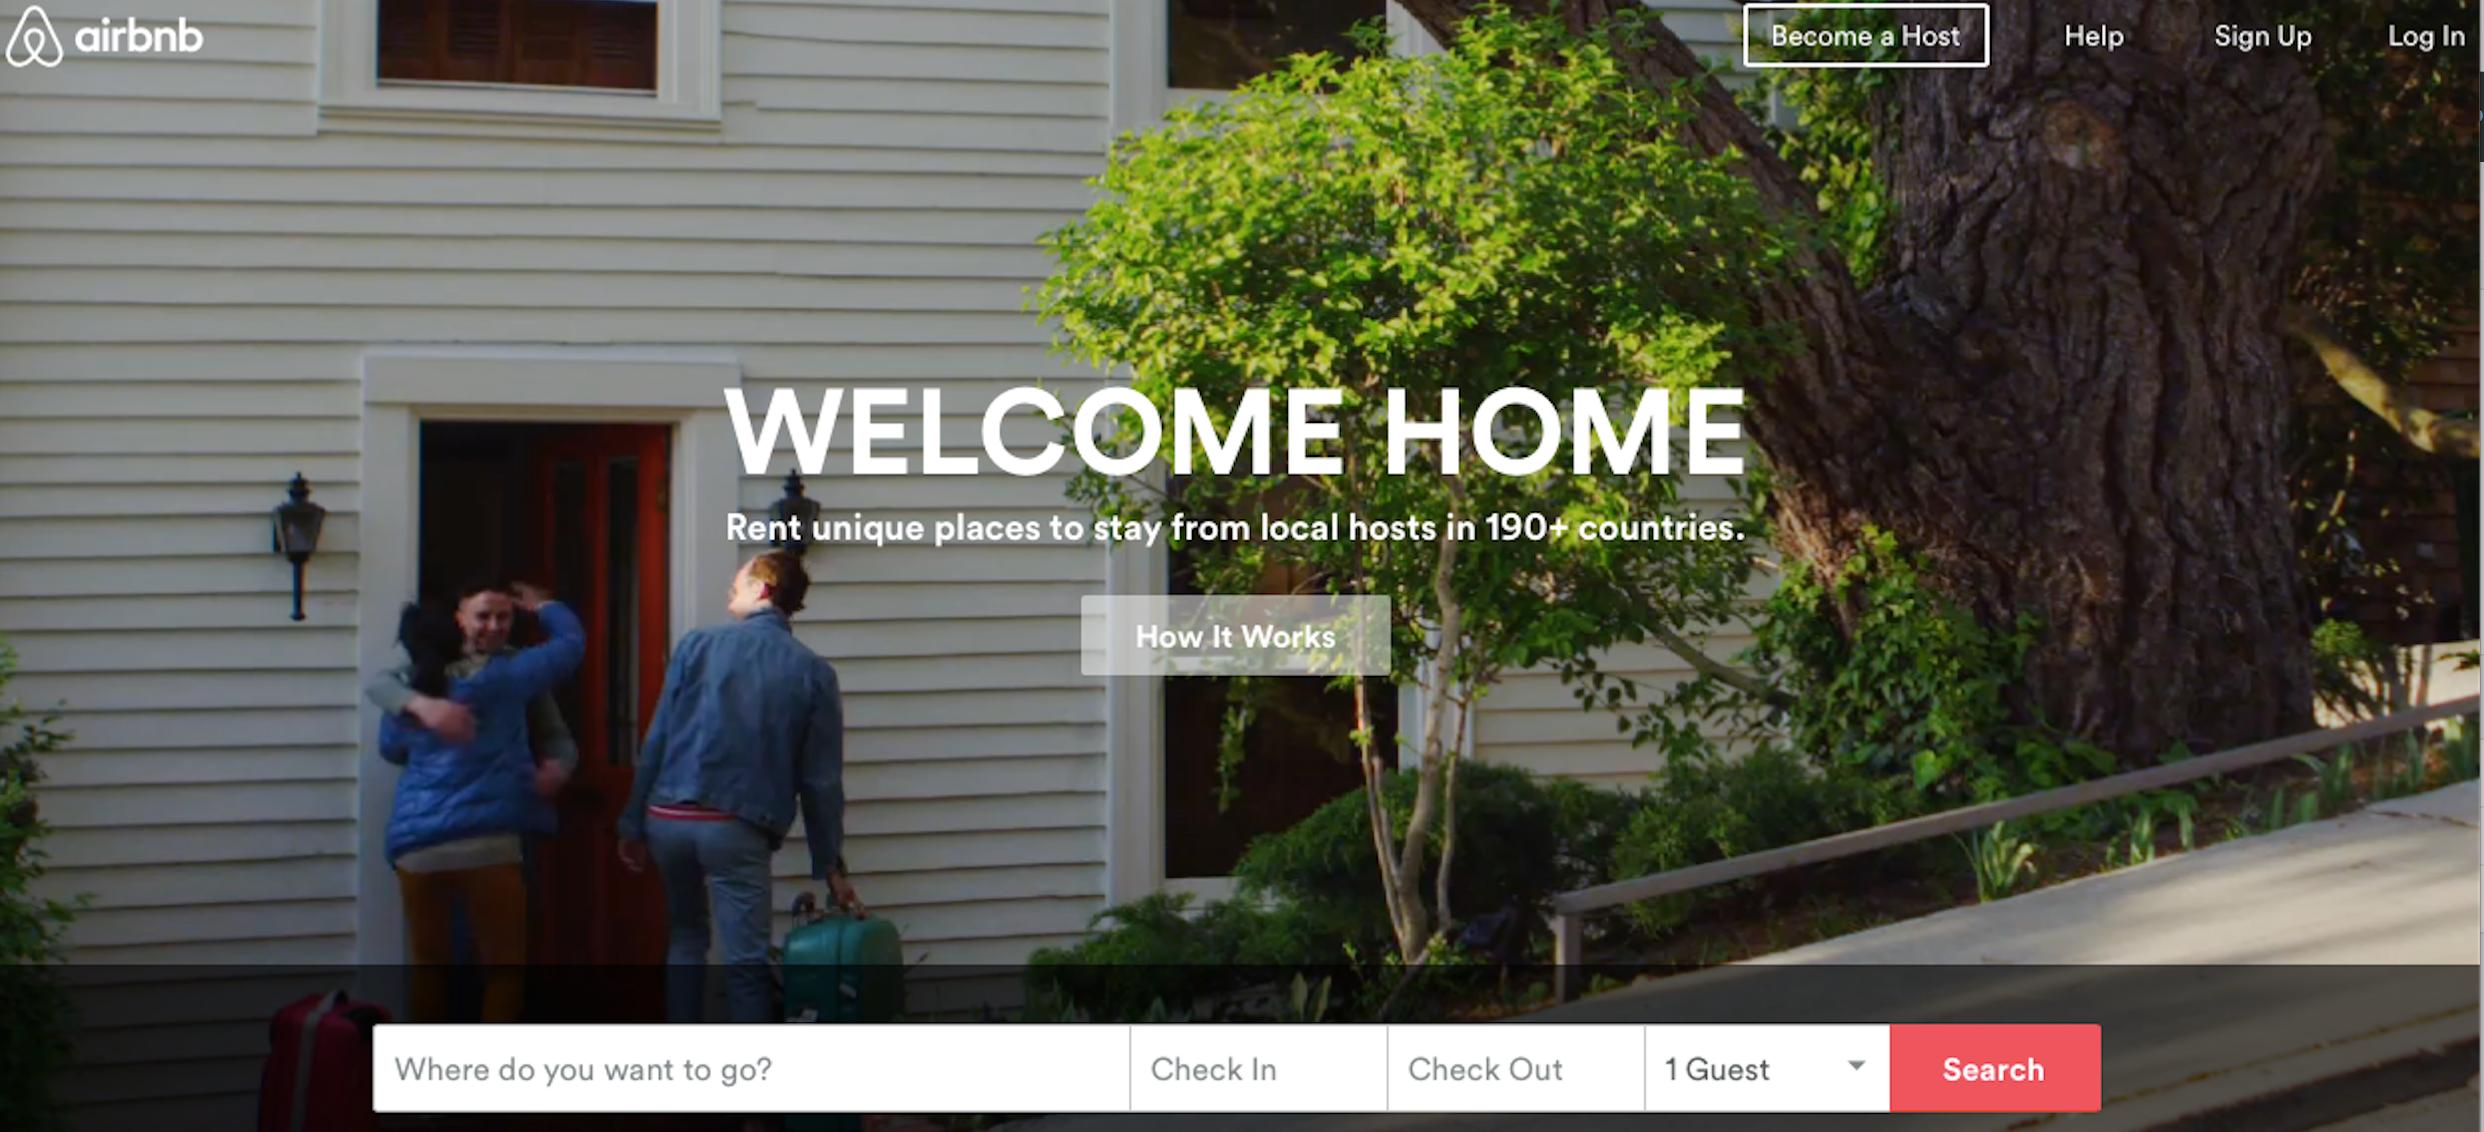 airbnb, TV, Househunters, HGTV